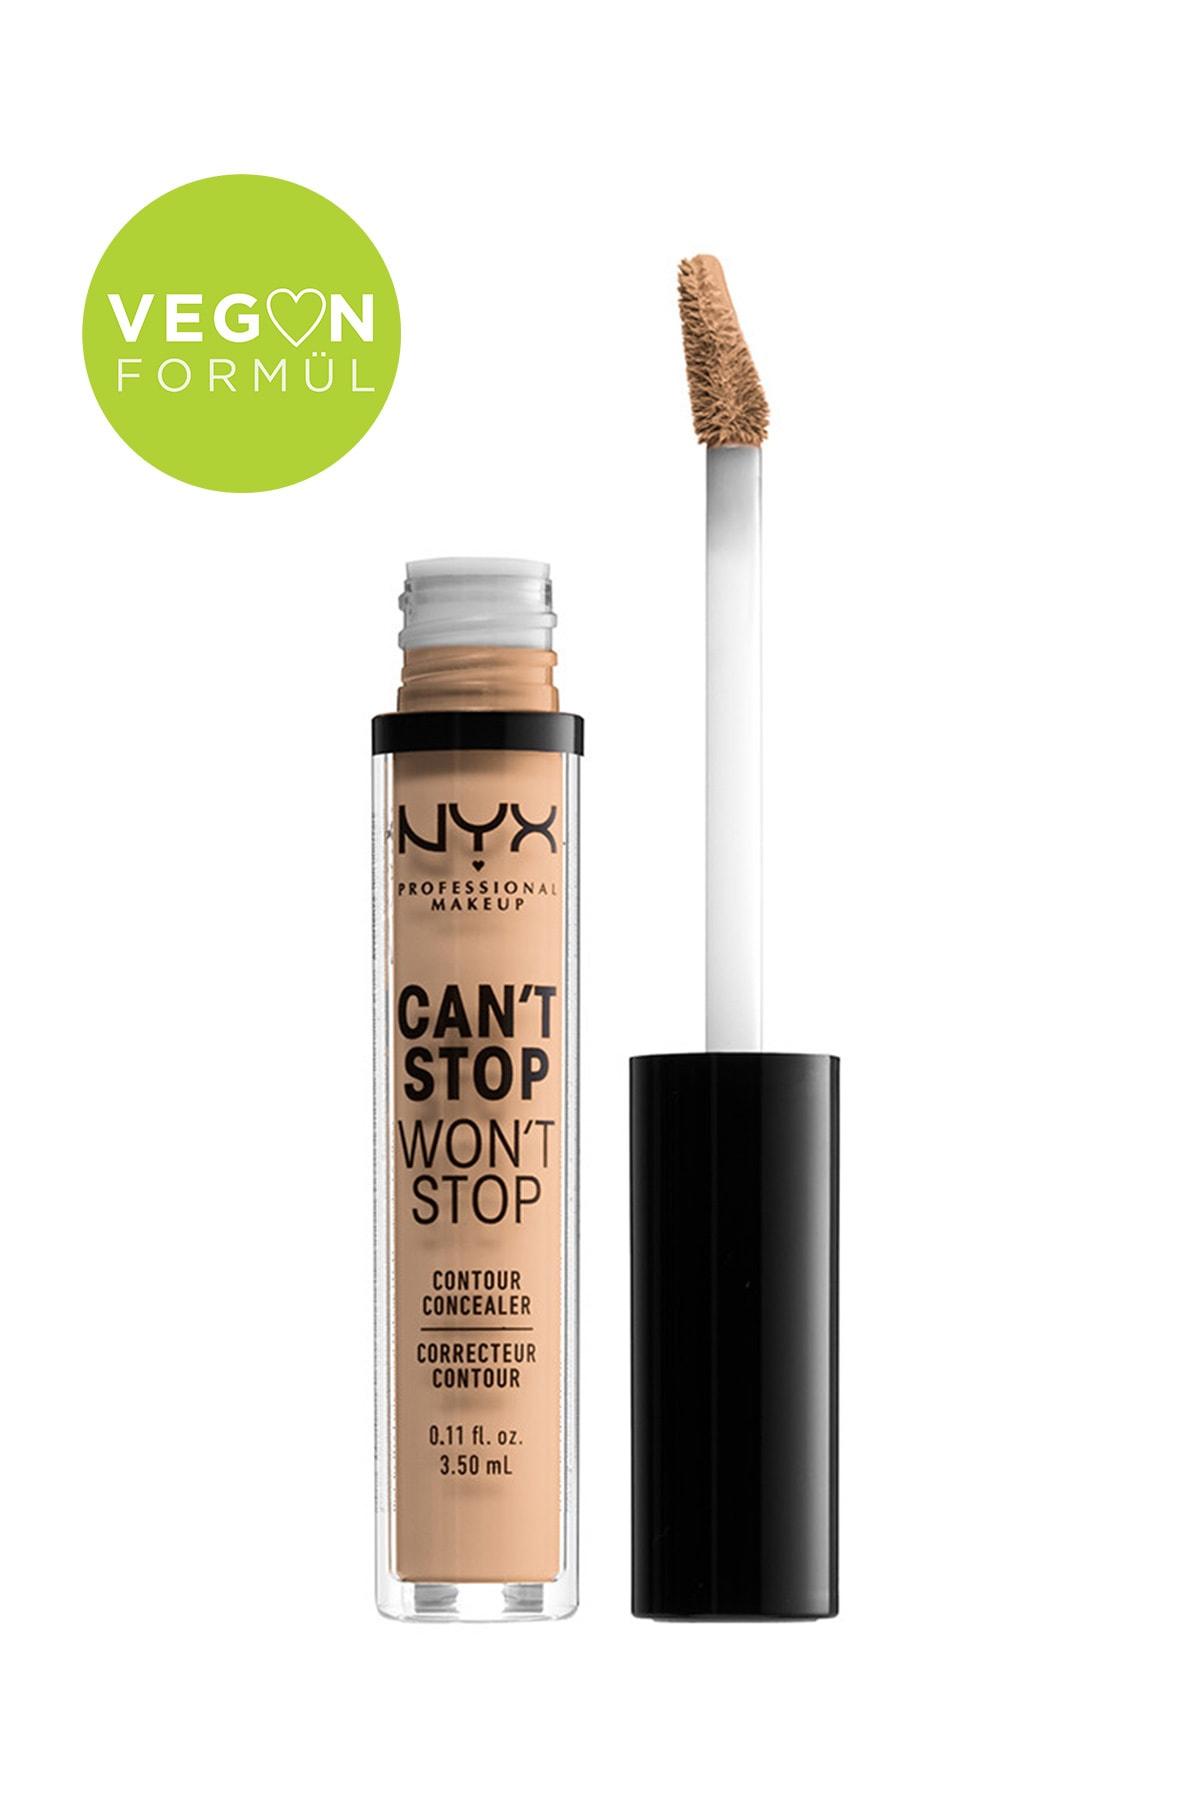 NYX Professional Makeup Kapatıcı - Can't Stop Won't Stop Contour Concealer 7 Natural 3.5 ml 800897168599 1